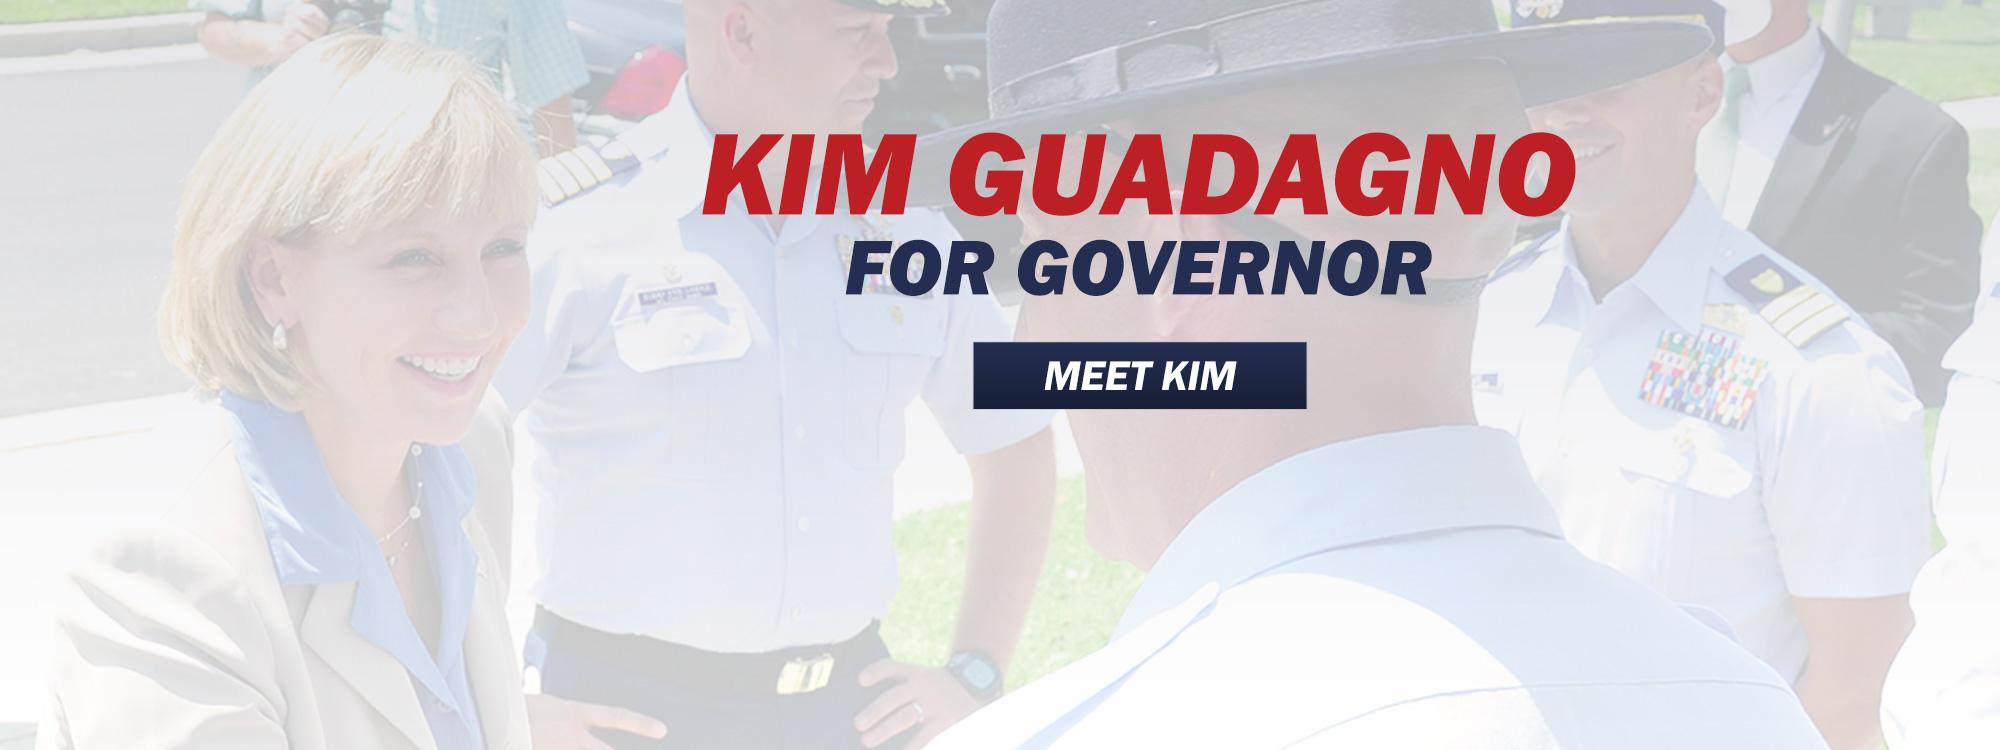 slide-guadagno-for-governor